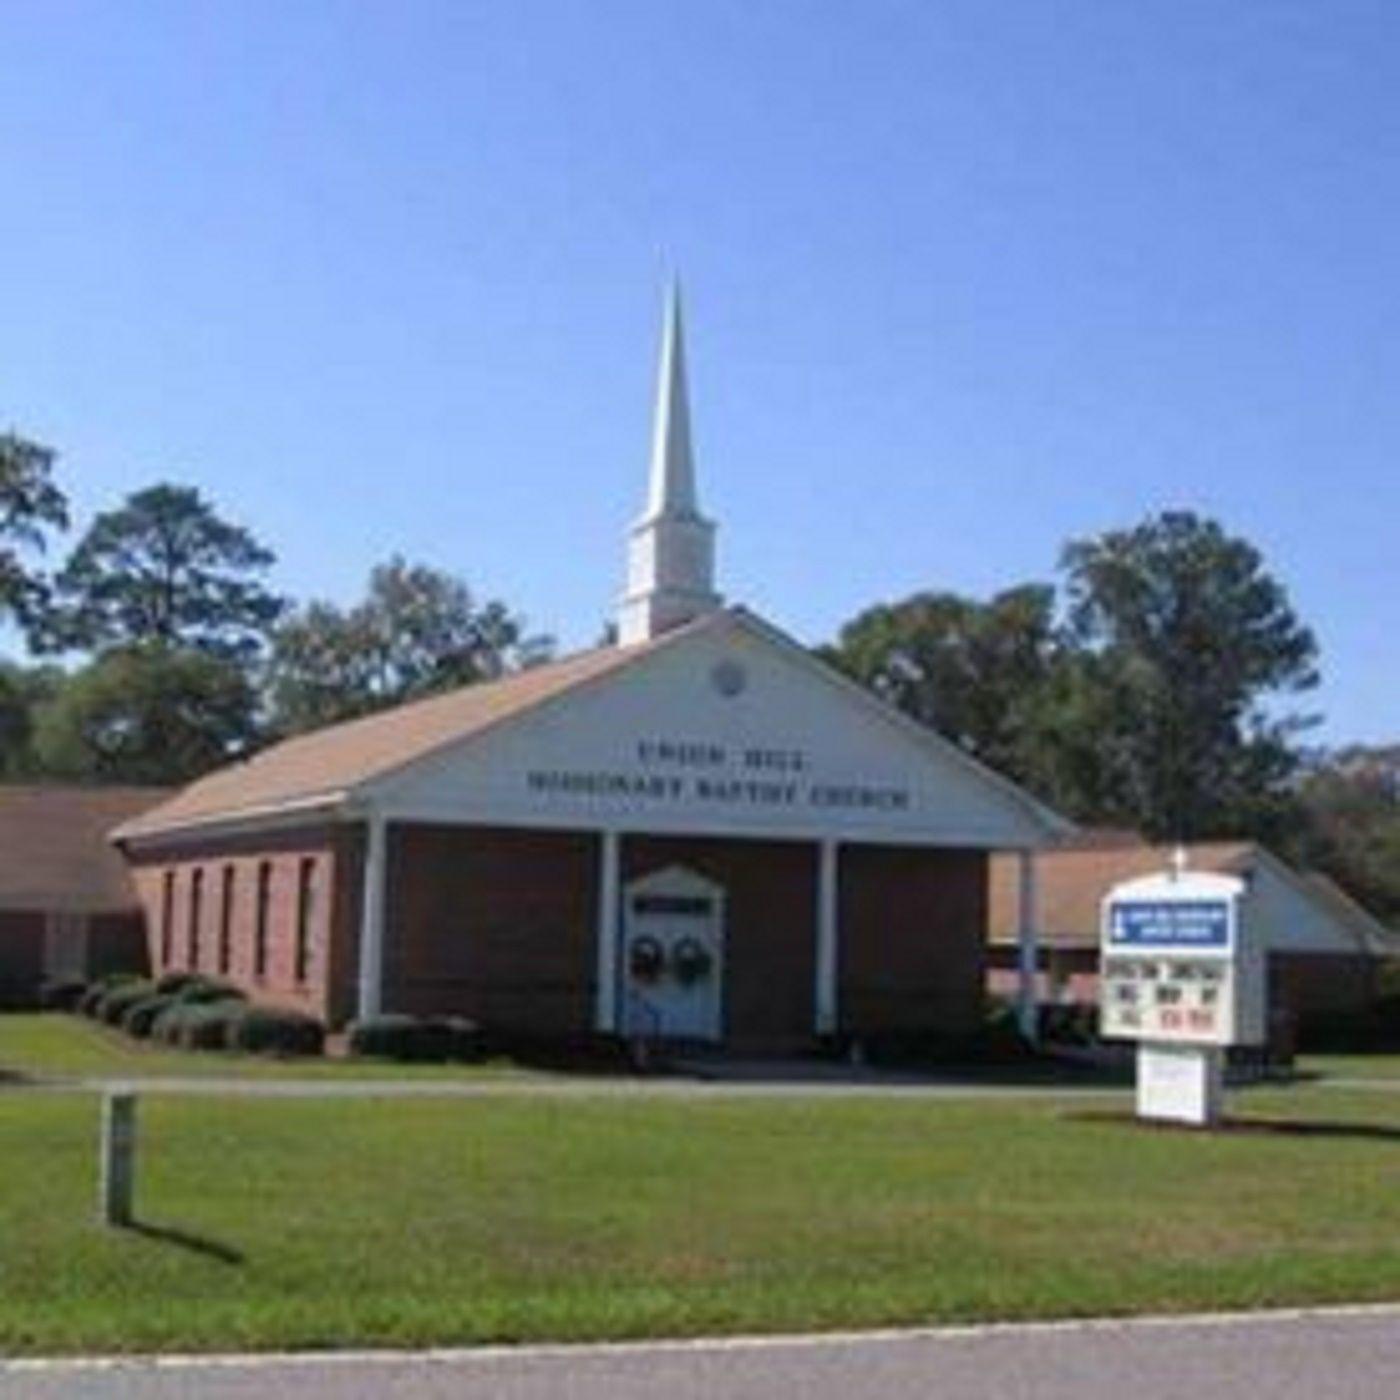 Union Hill Baptist Church